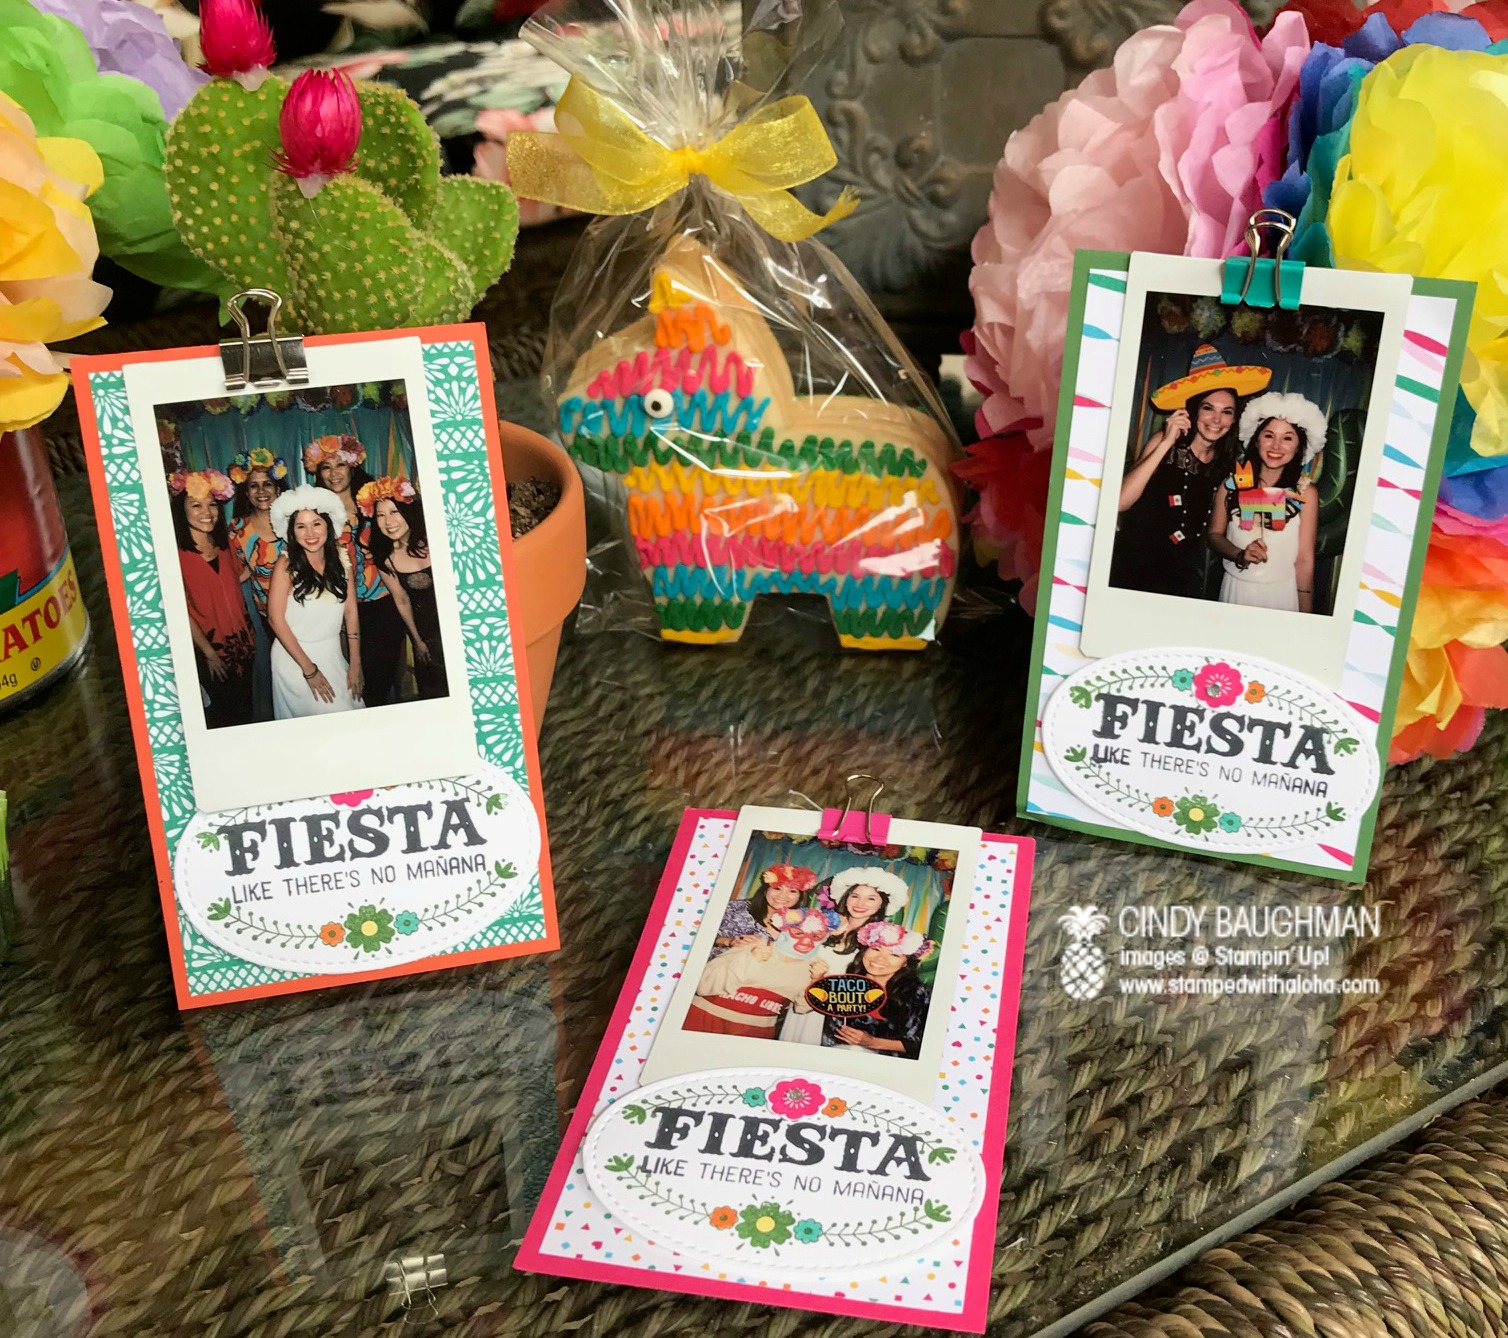 Bridal Fiesta Photo Cards - www.stampedwithaloha.com